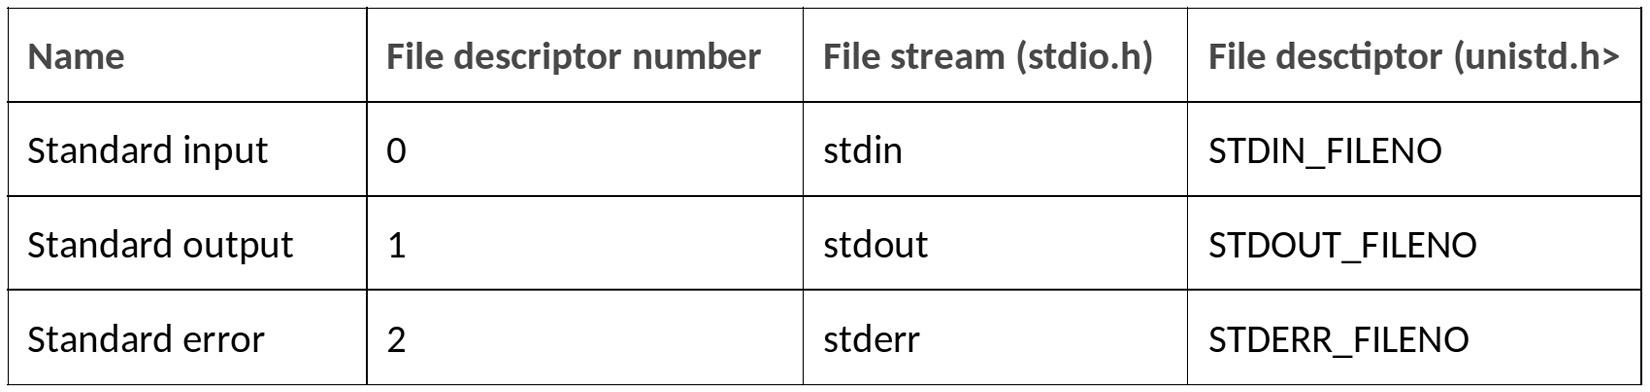 Figure 2.3 – File descriptors and file streams in Linux